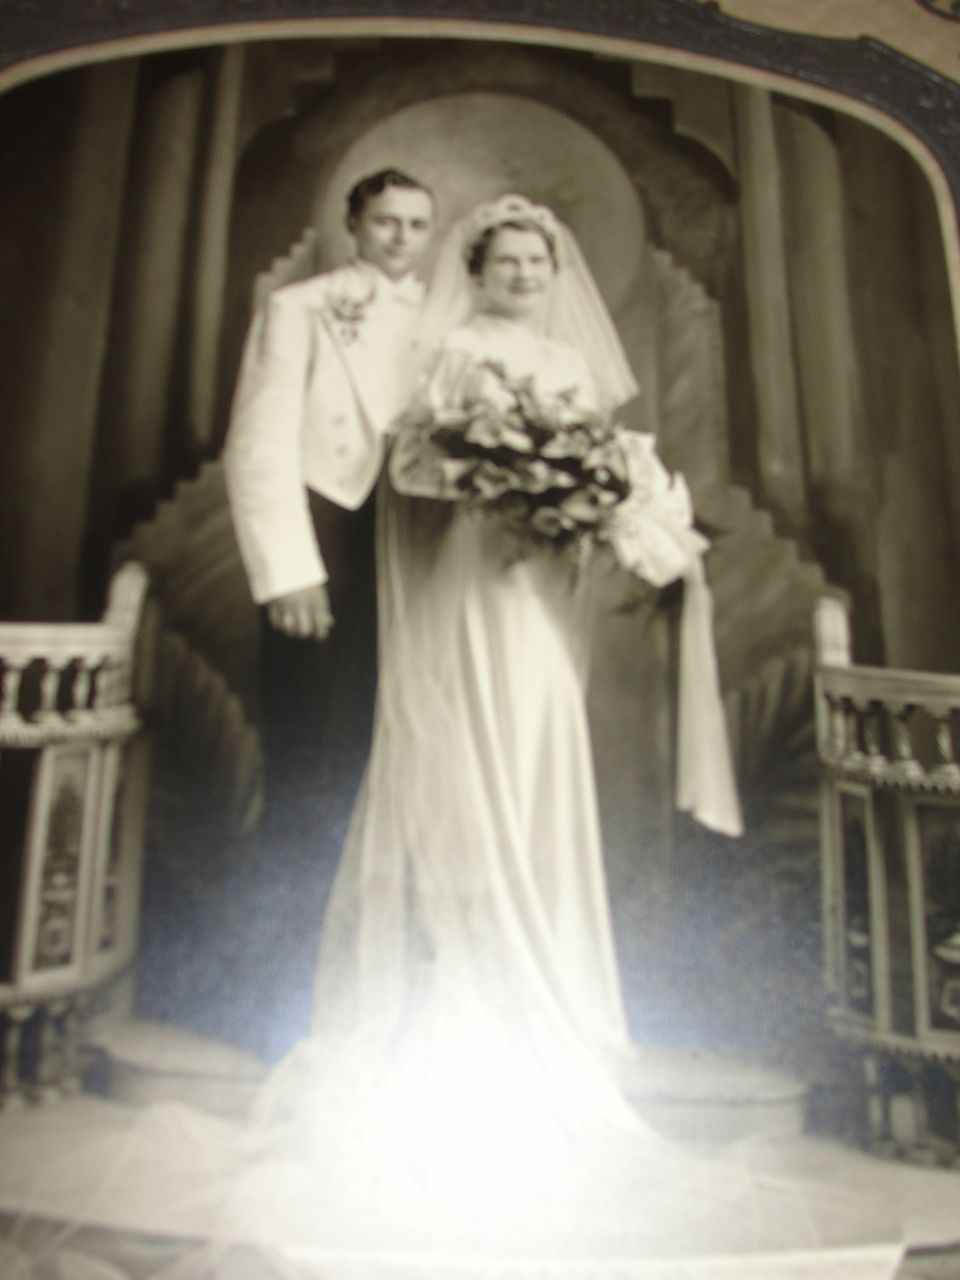 Sweetheart Bride and Dapper Groom Wedding Photo